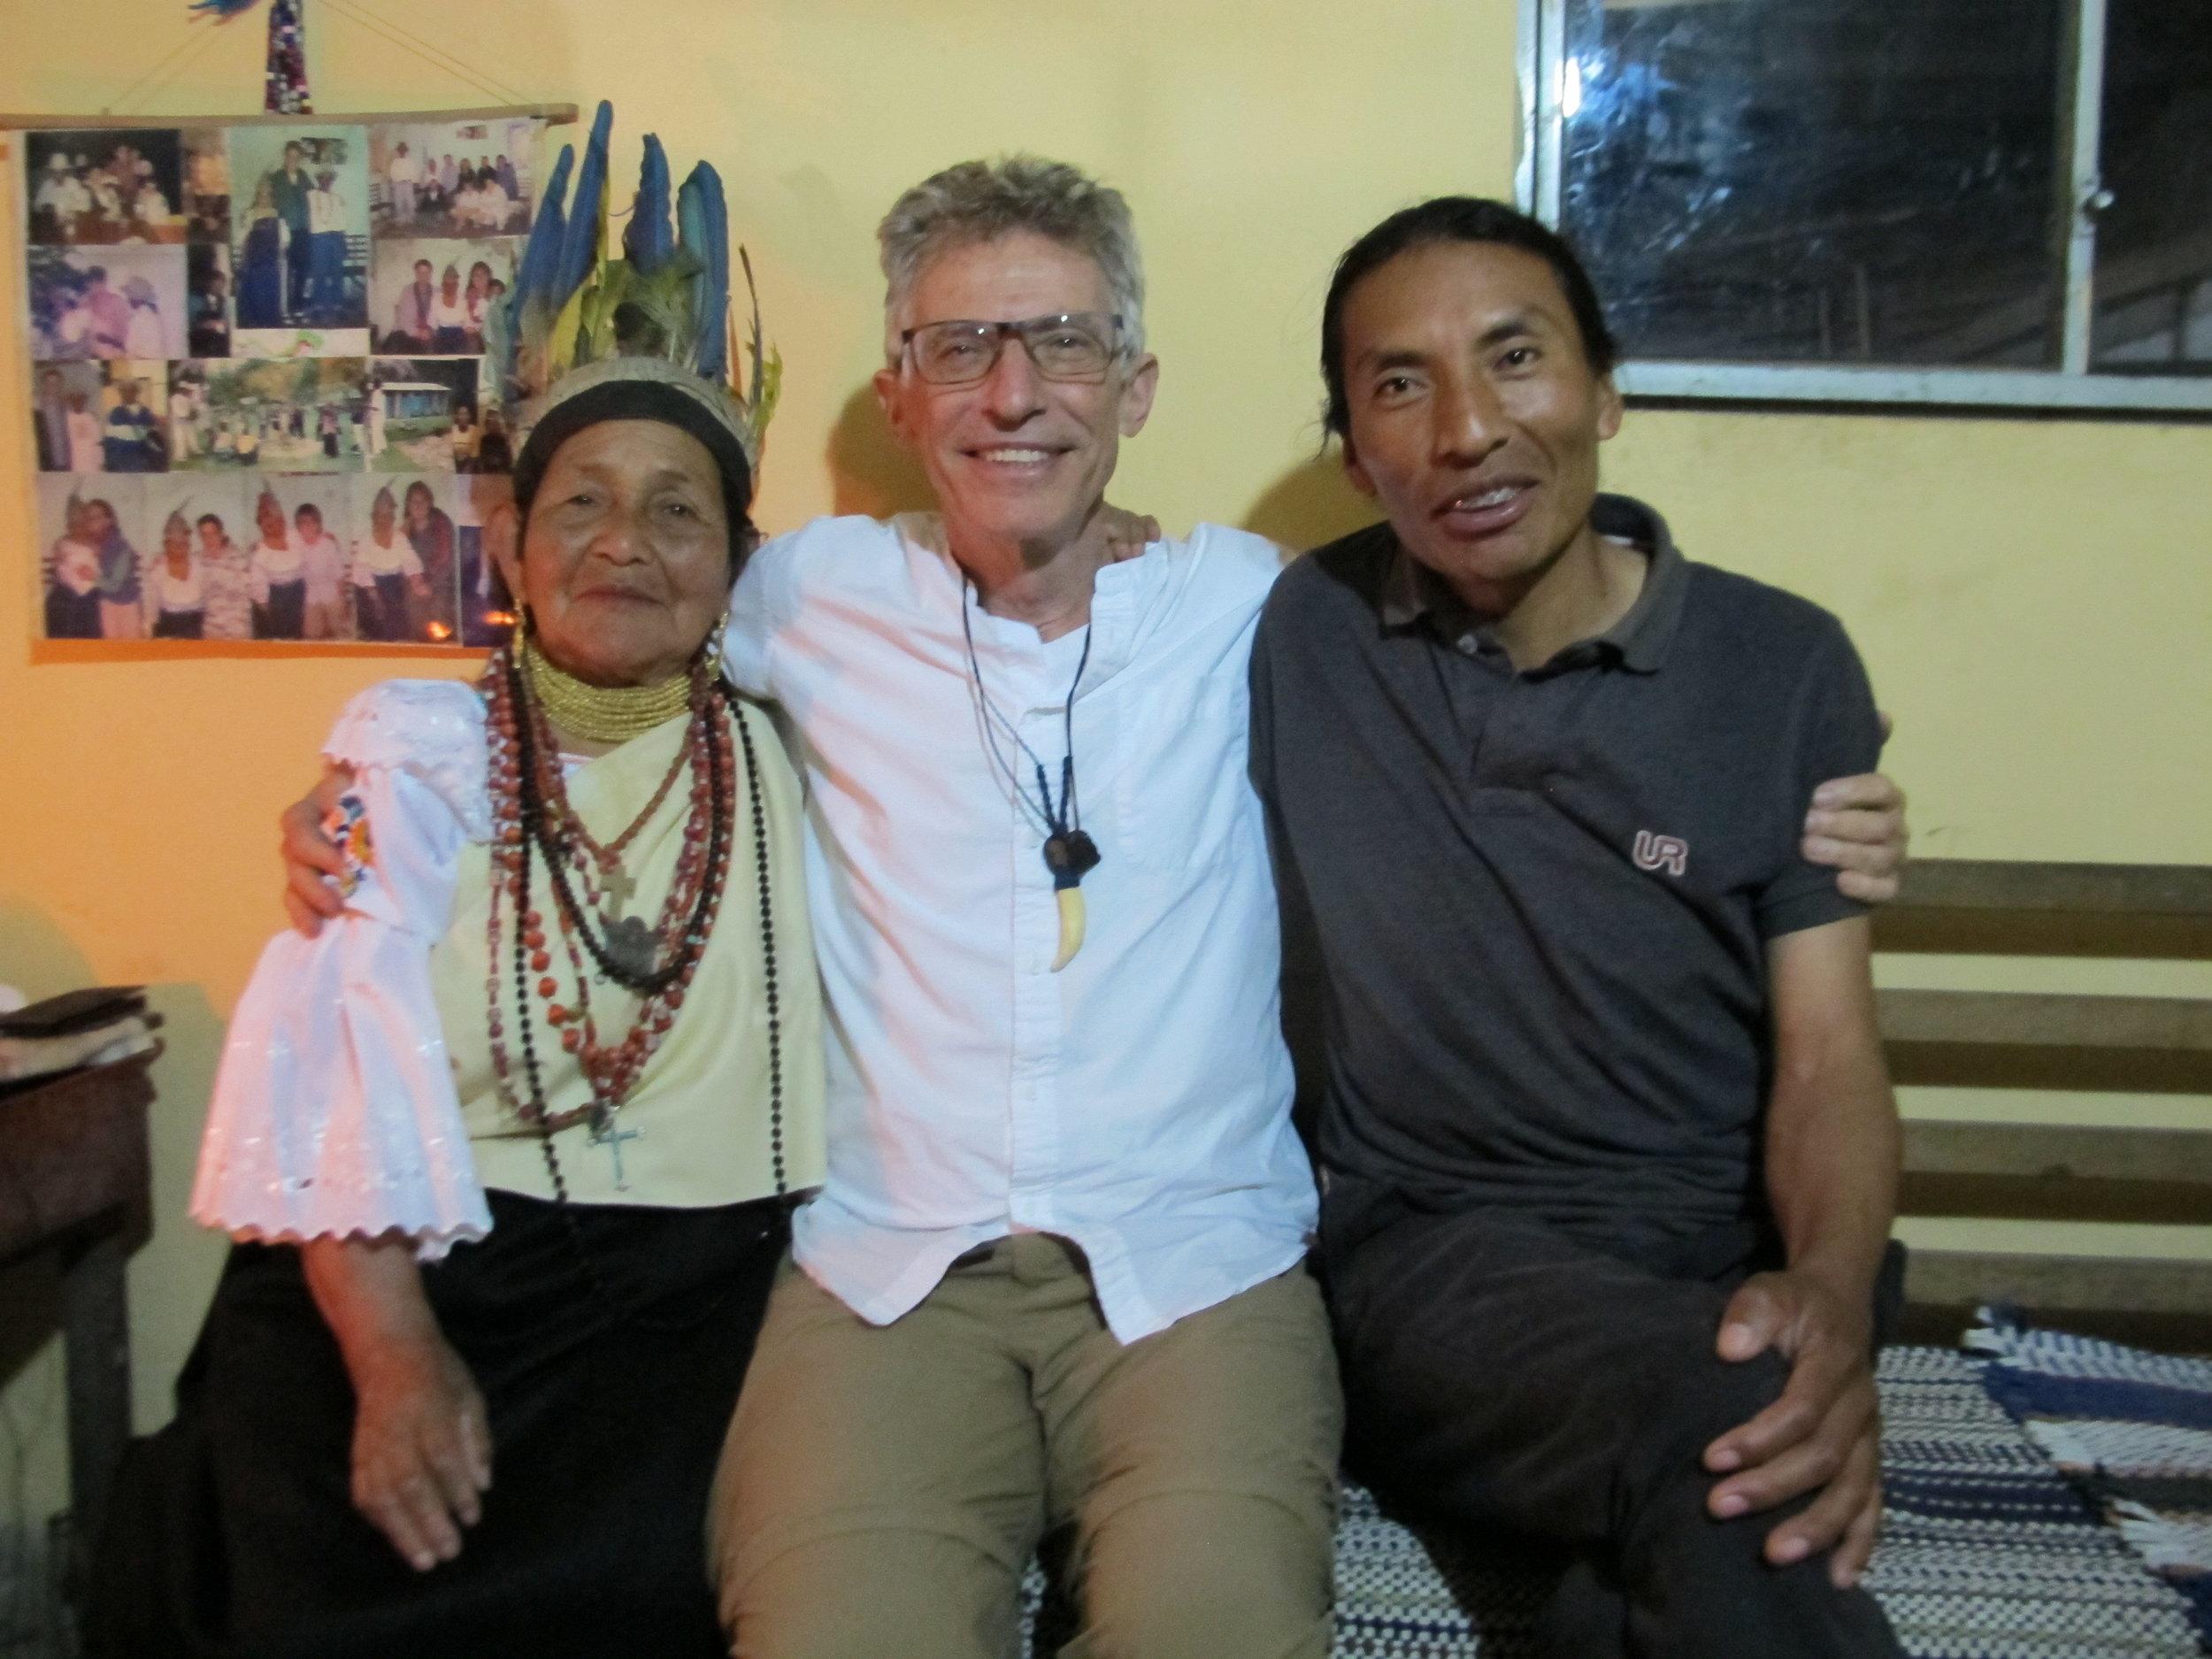 The Doña Maria Juana Yamberla and her son Raul, both powerful healers and teachers.